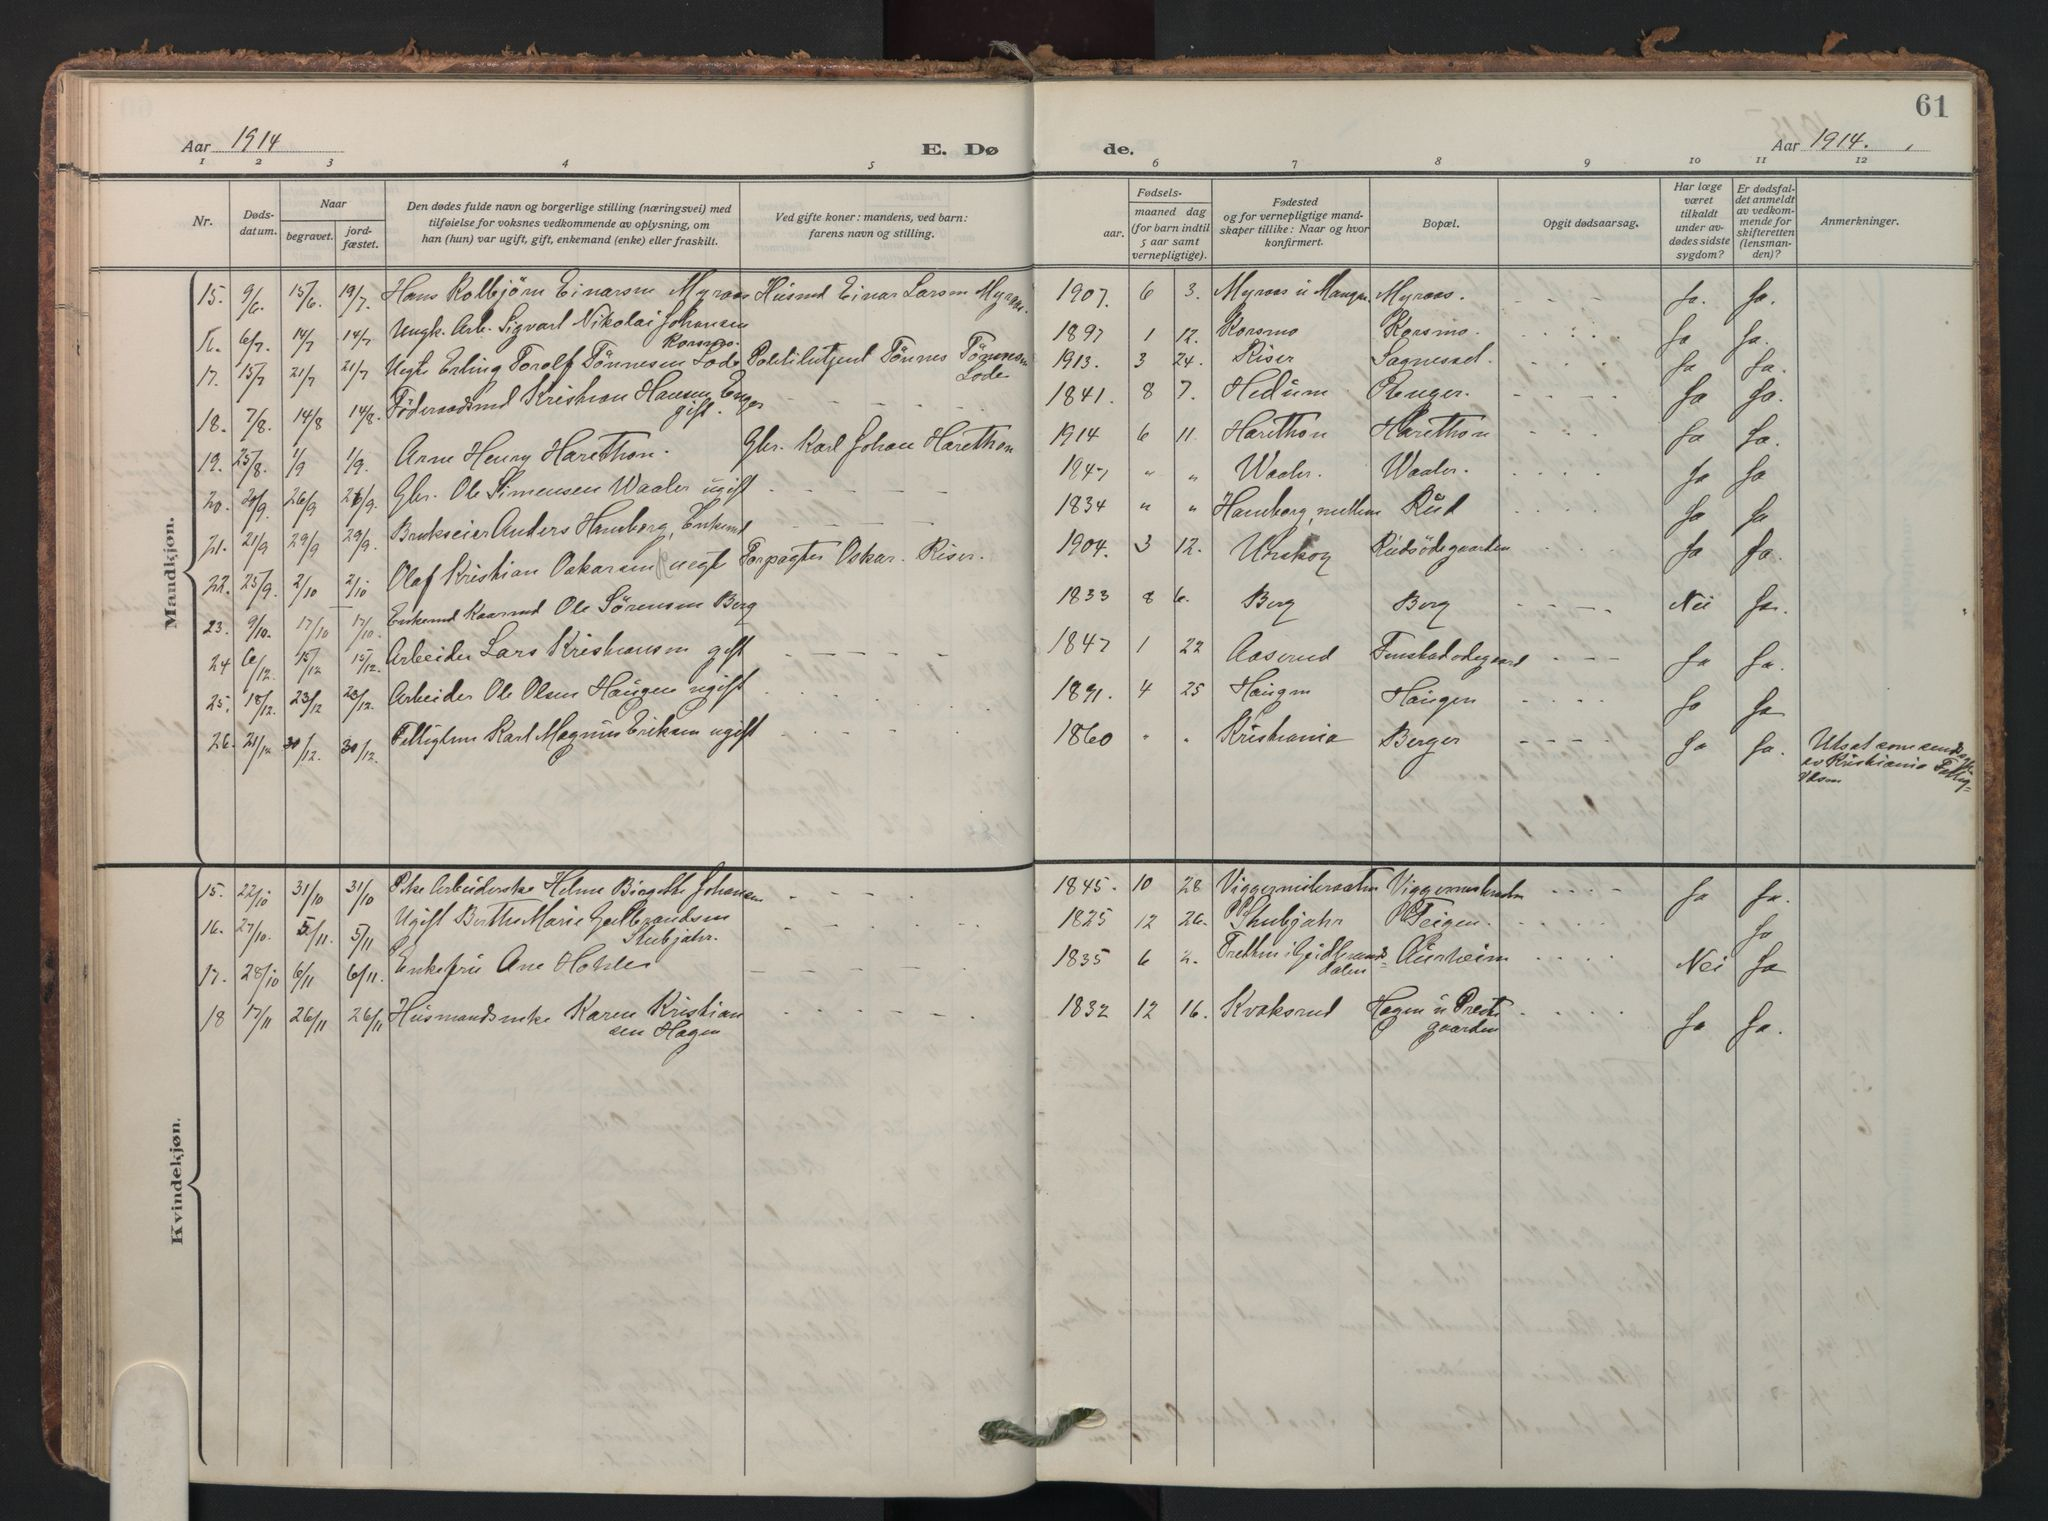 SAO, Aurskog prestekontor Kirkebøker, F/Fa/L0016: Parish register (official) no. I 16, 1910-1934, p. 61